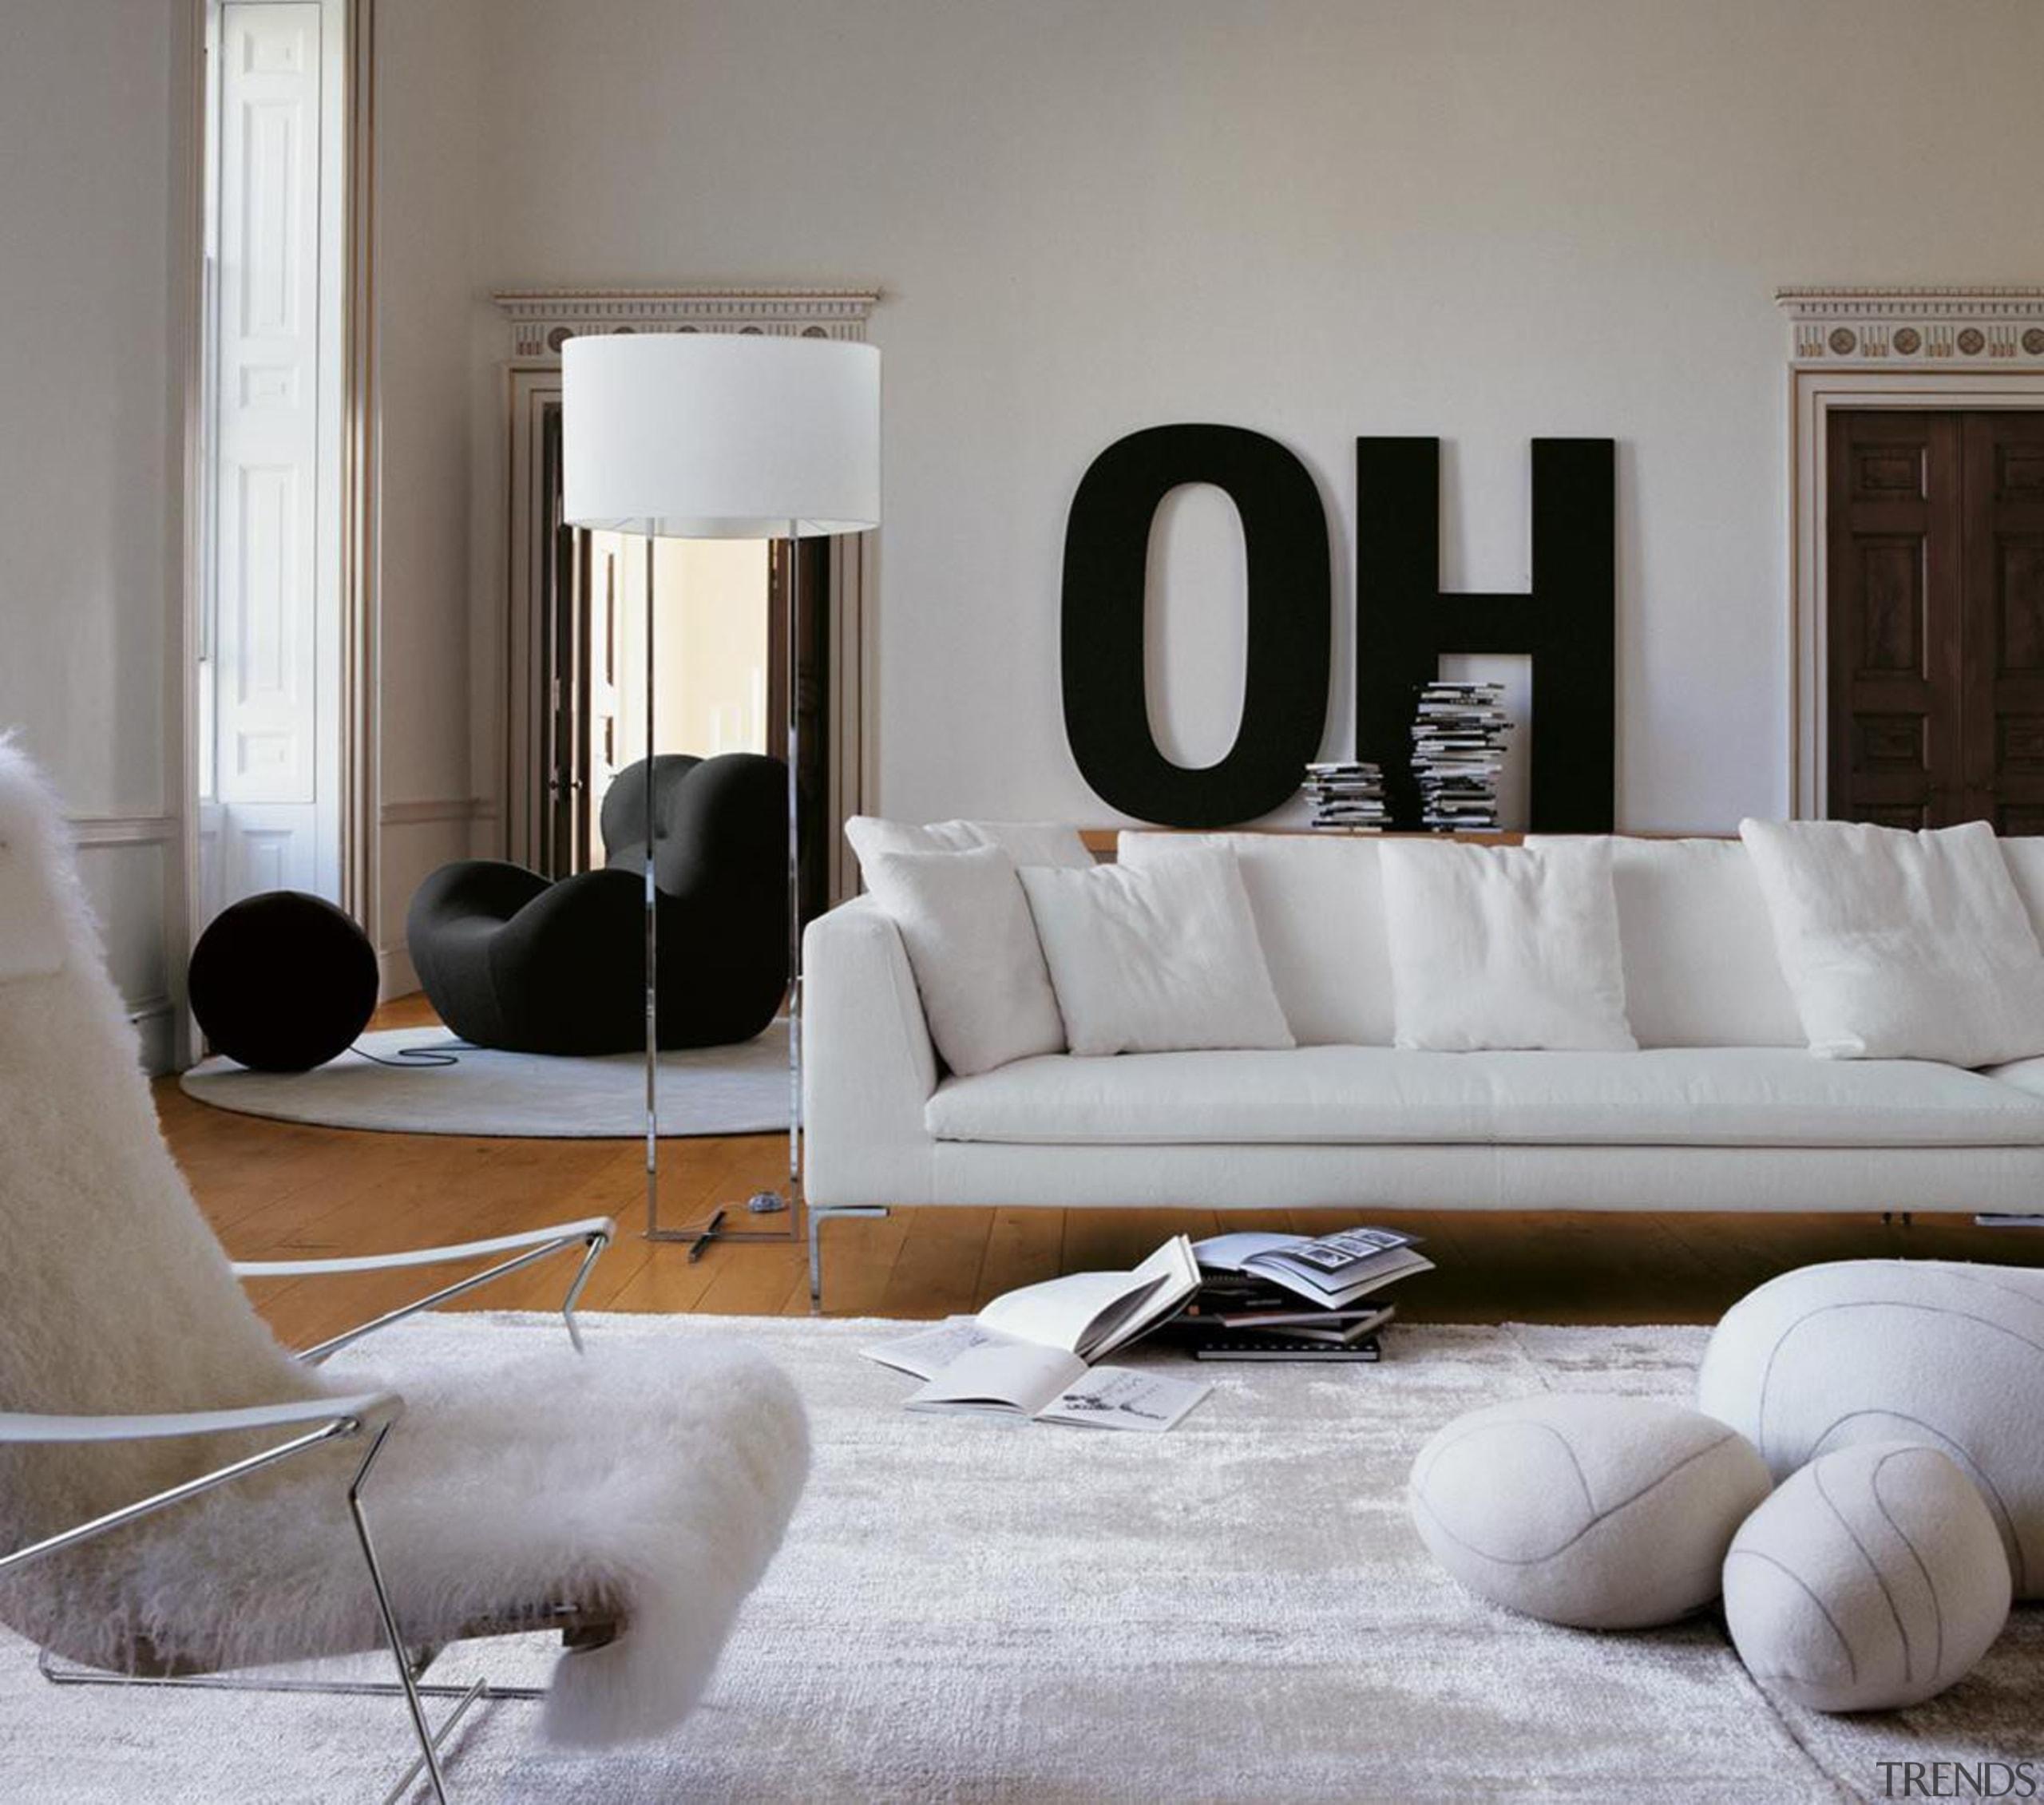 bebitaliacitteriocharleslargesofalightinstu1200.jpg chair, coffee table, couch, floor, flooring, furniture, home, interior design, living room, product design, room, table, gray